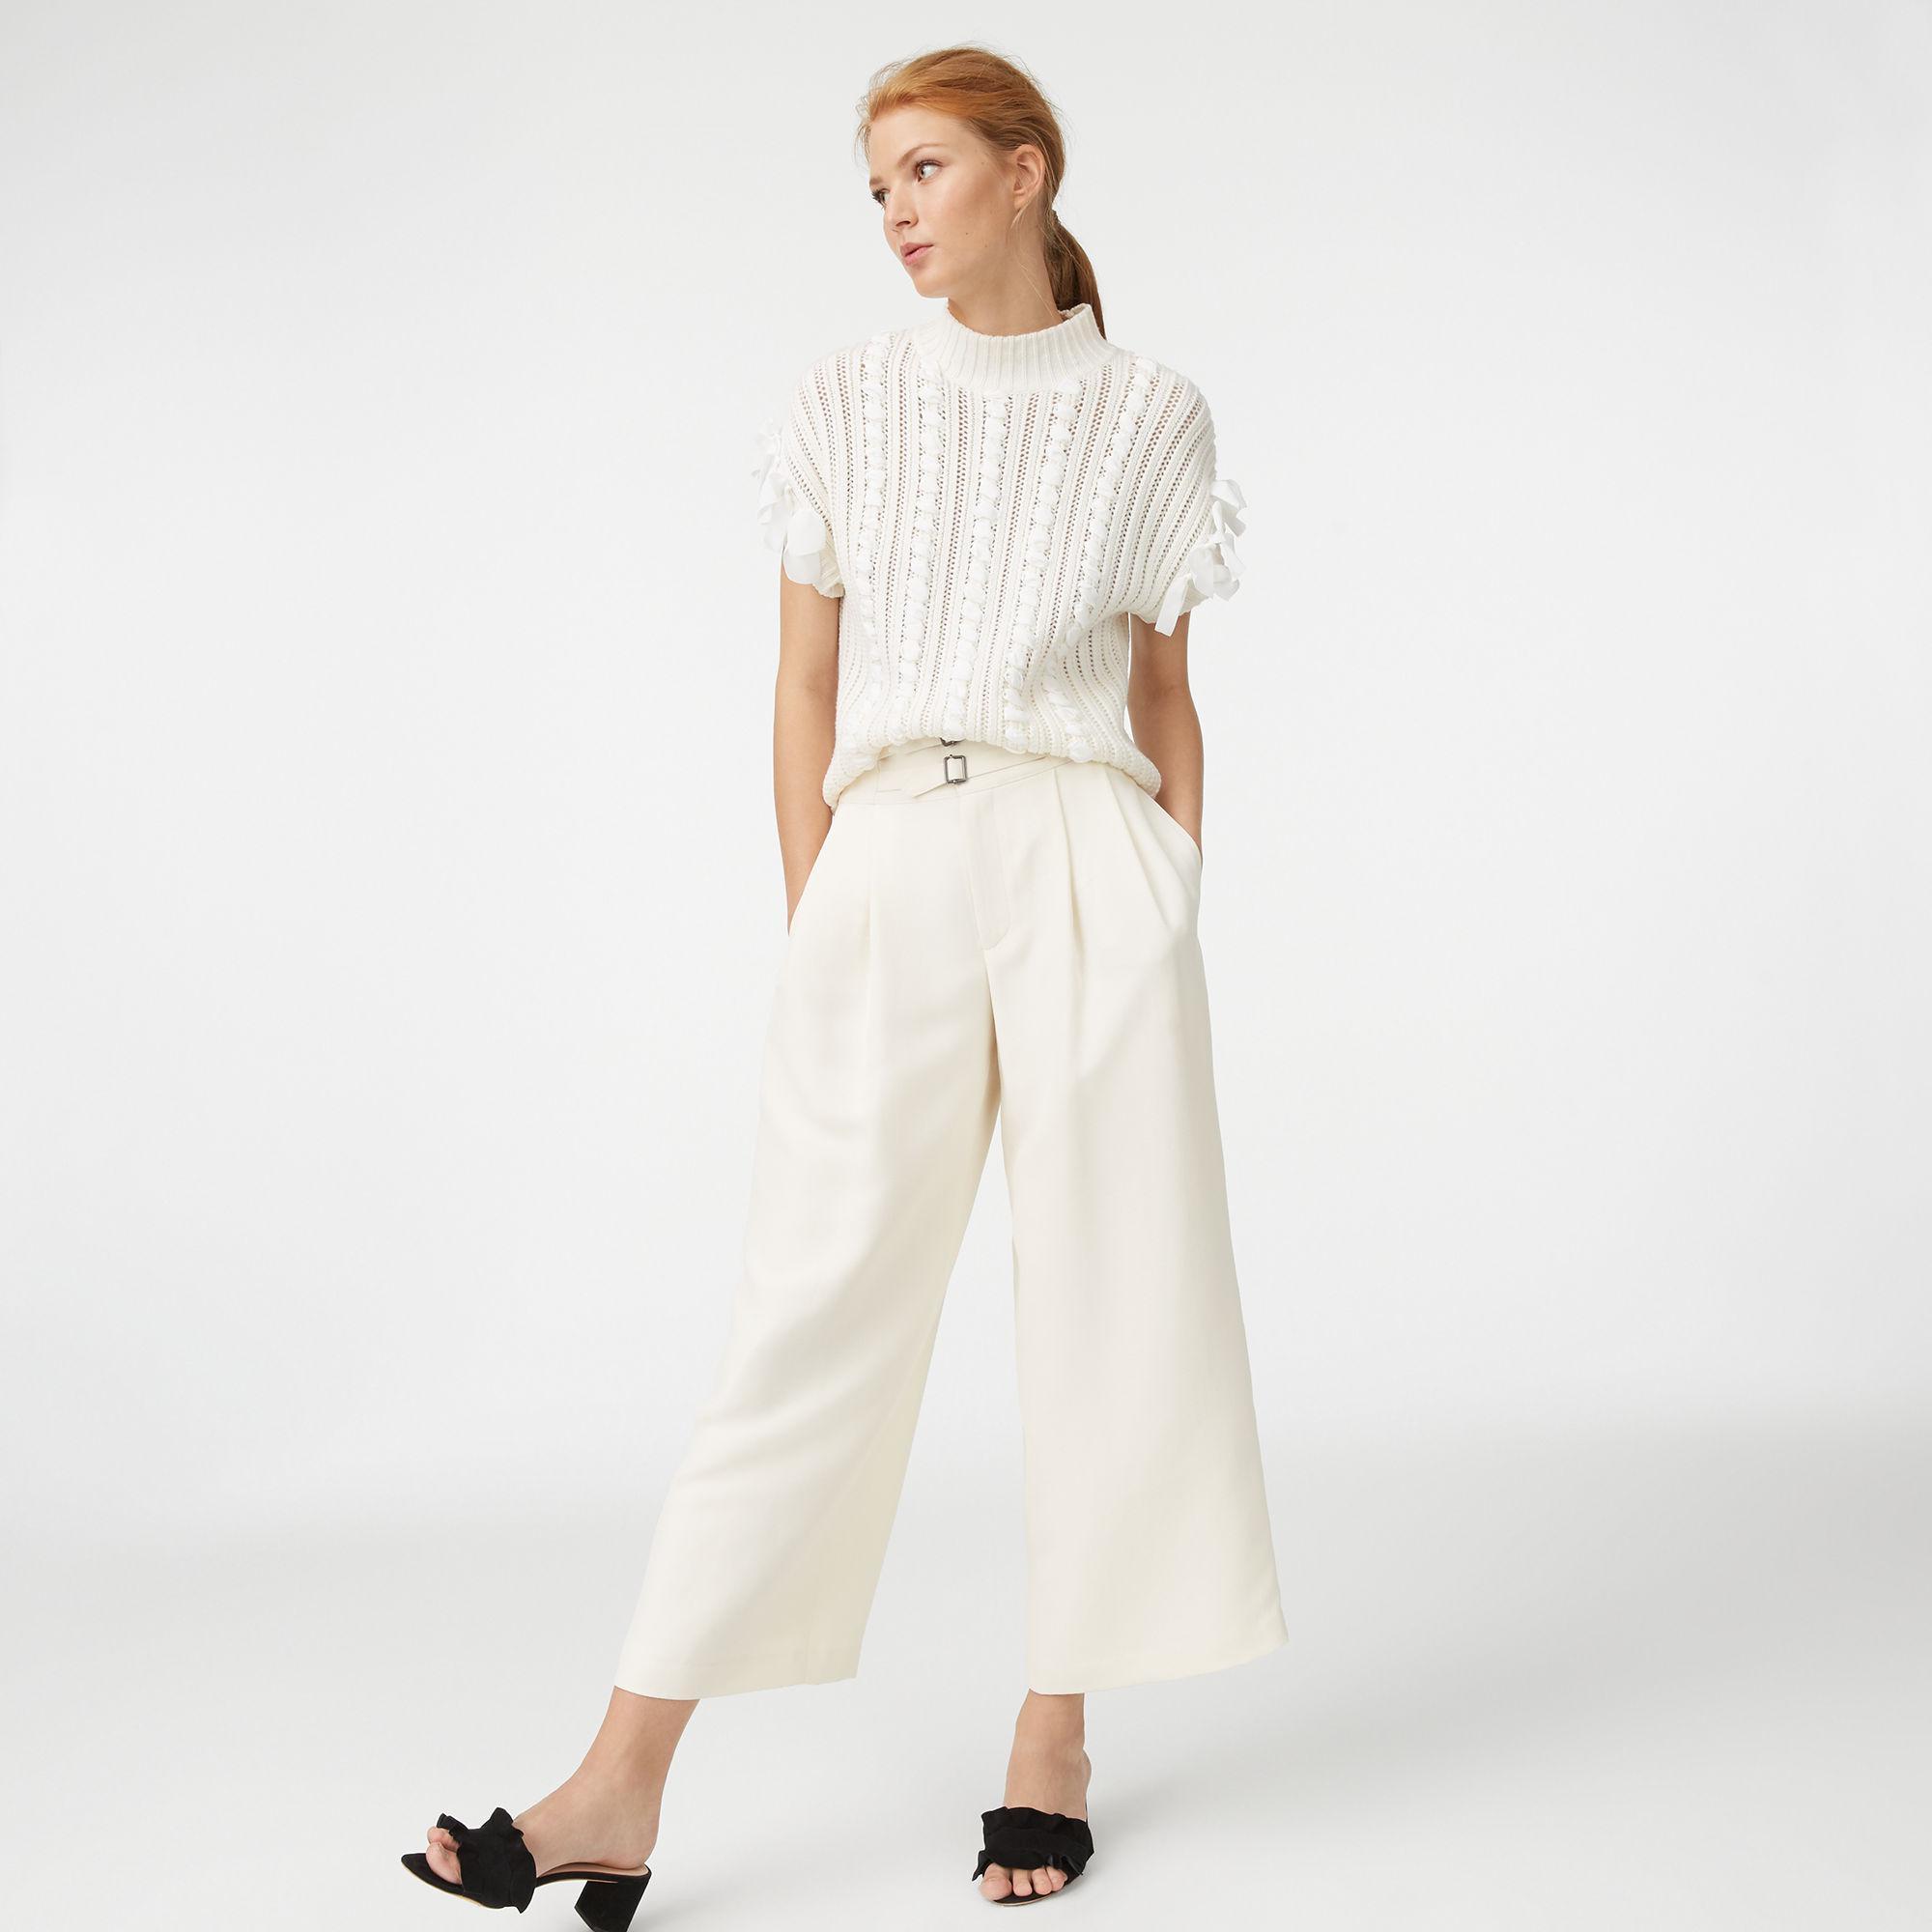 7584337b568 Lyst - Club Monaco Shiyah Pant in White